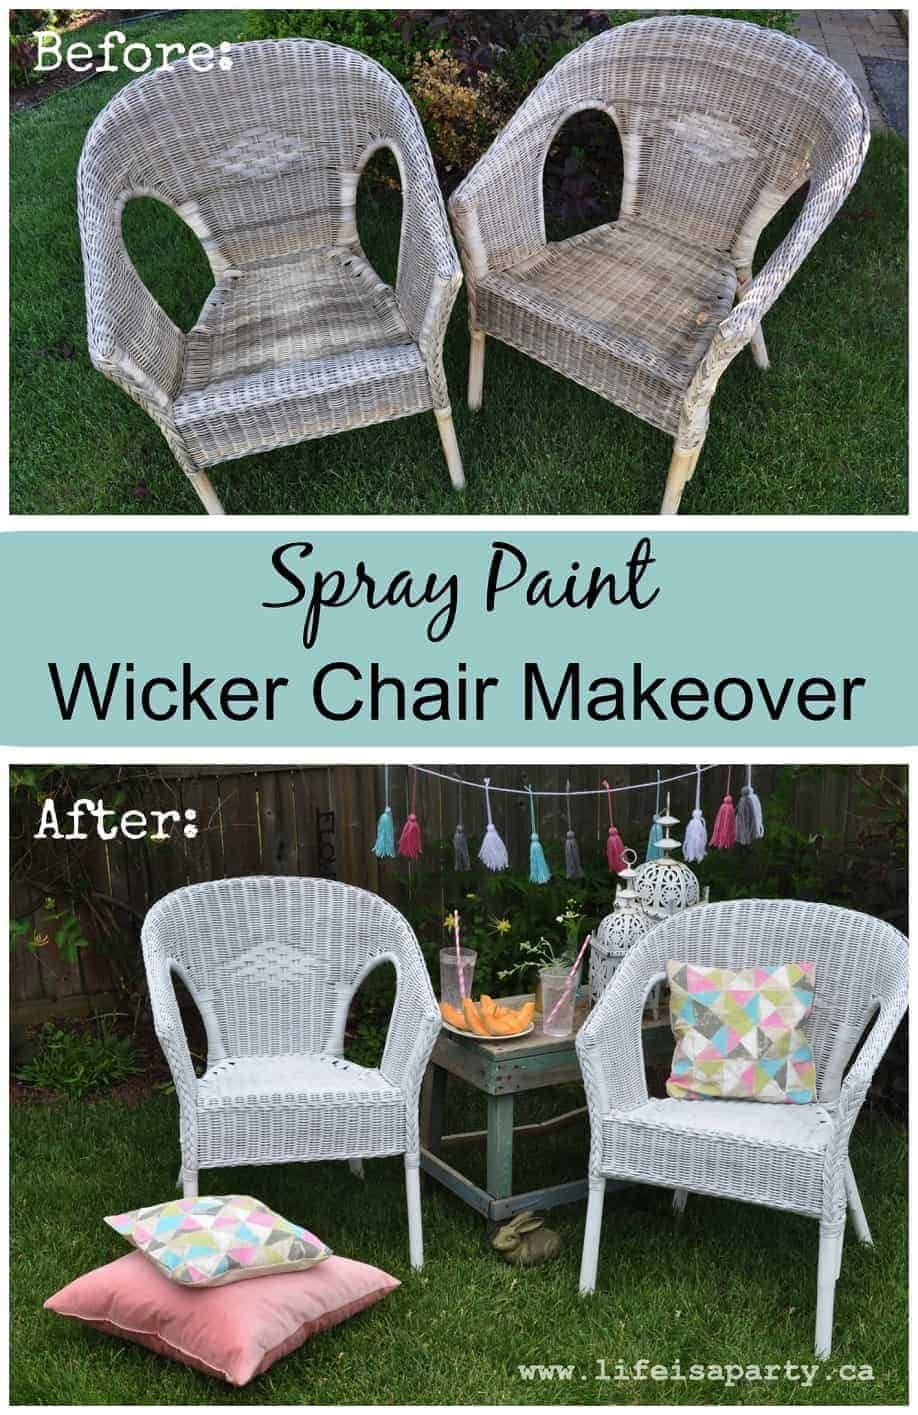 6 DIY Home and Garden Interior Spray Paint Ideas